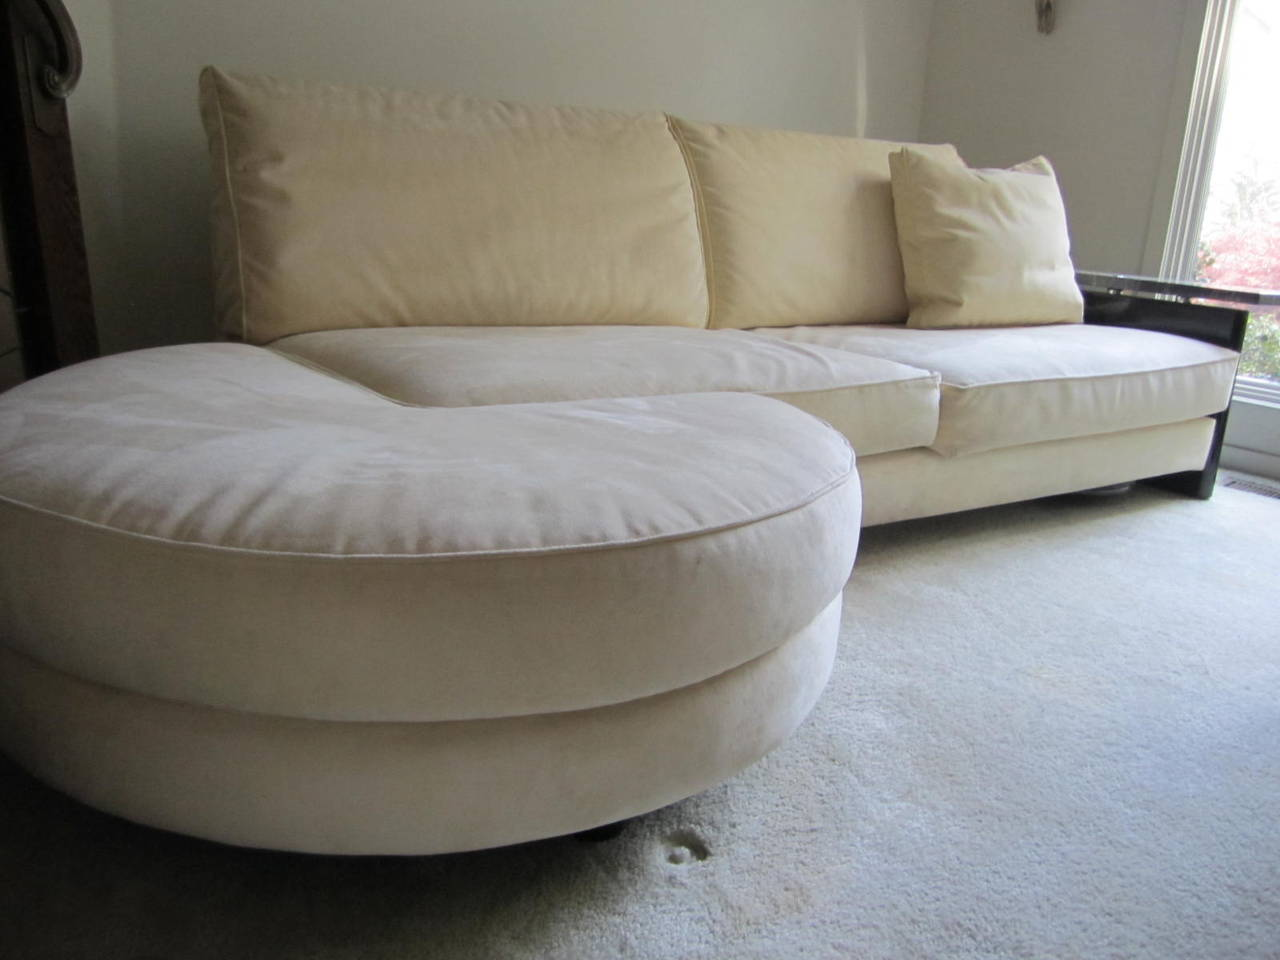 Stunning Italian Arketipo Roche Bobois Two-Piece Sofa Mid-Century Modern For Sale 3